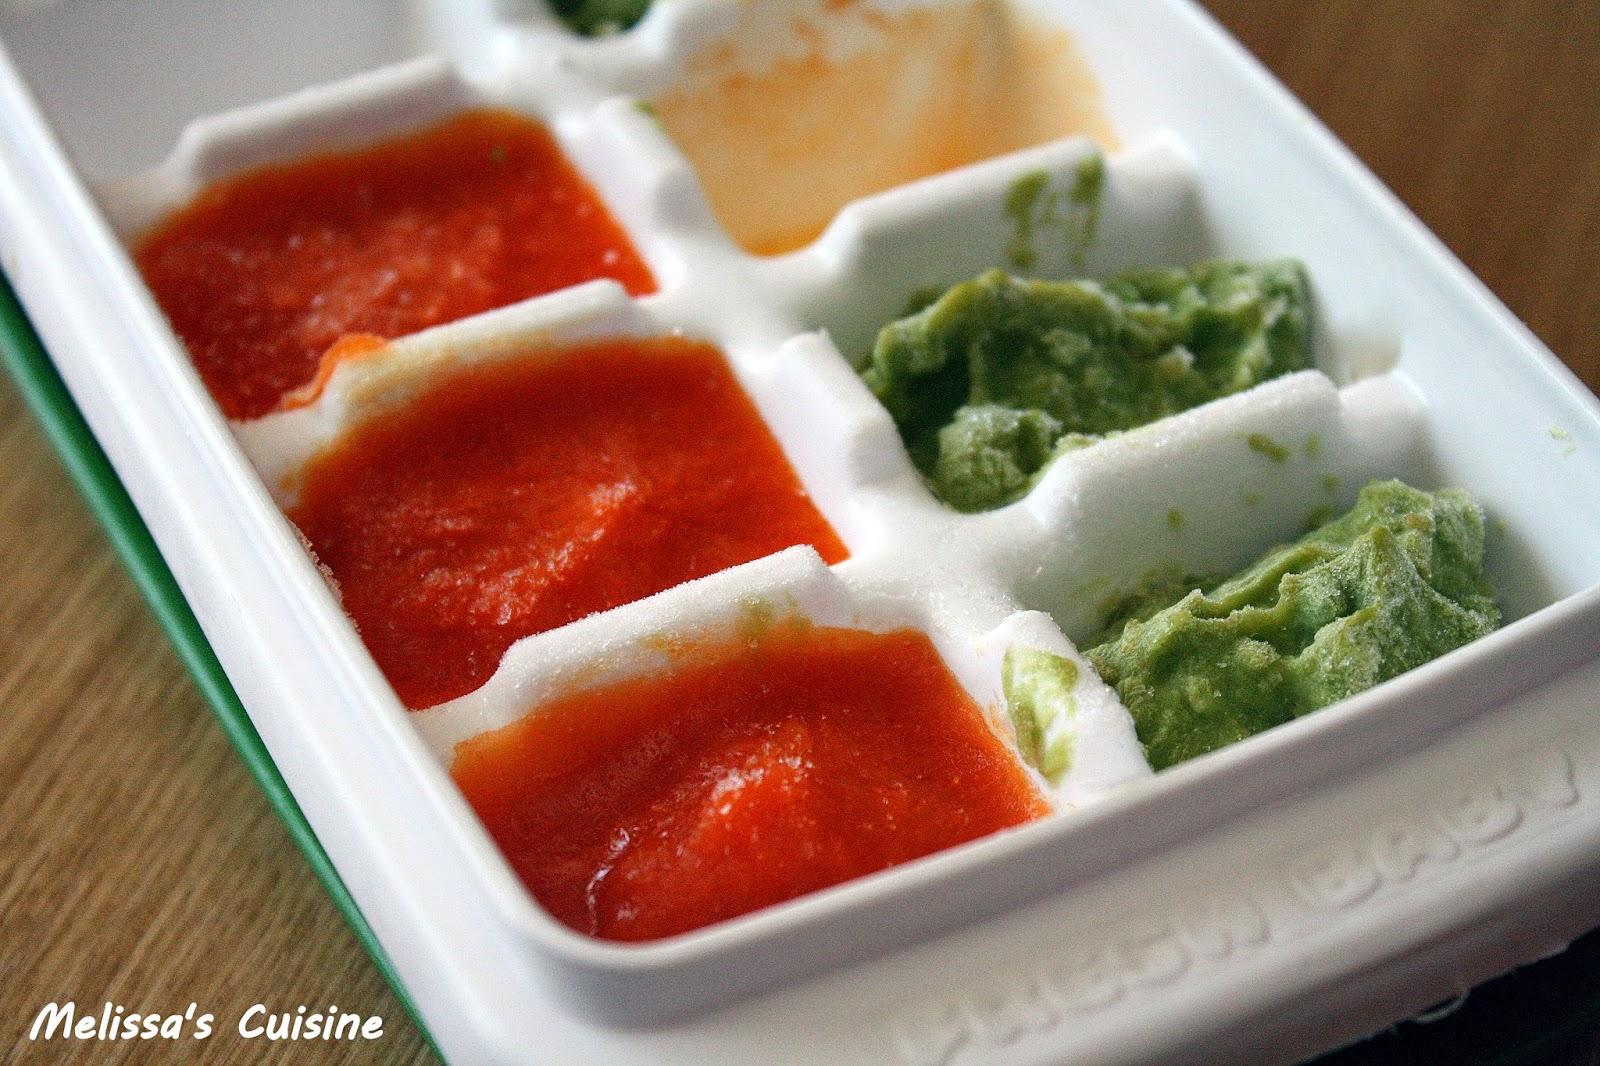 Melissa's Cuisine:  Homemade Baby Food: Vegetables